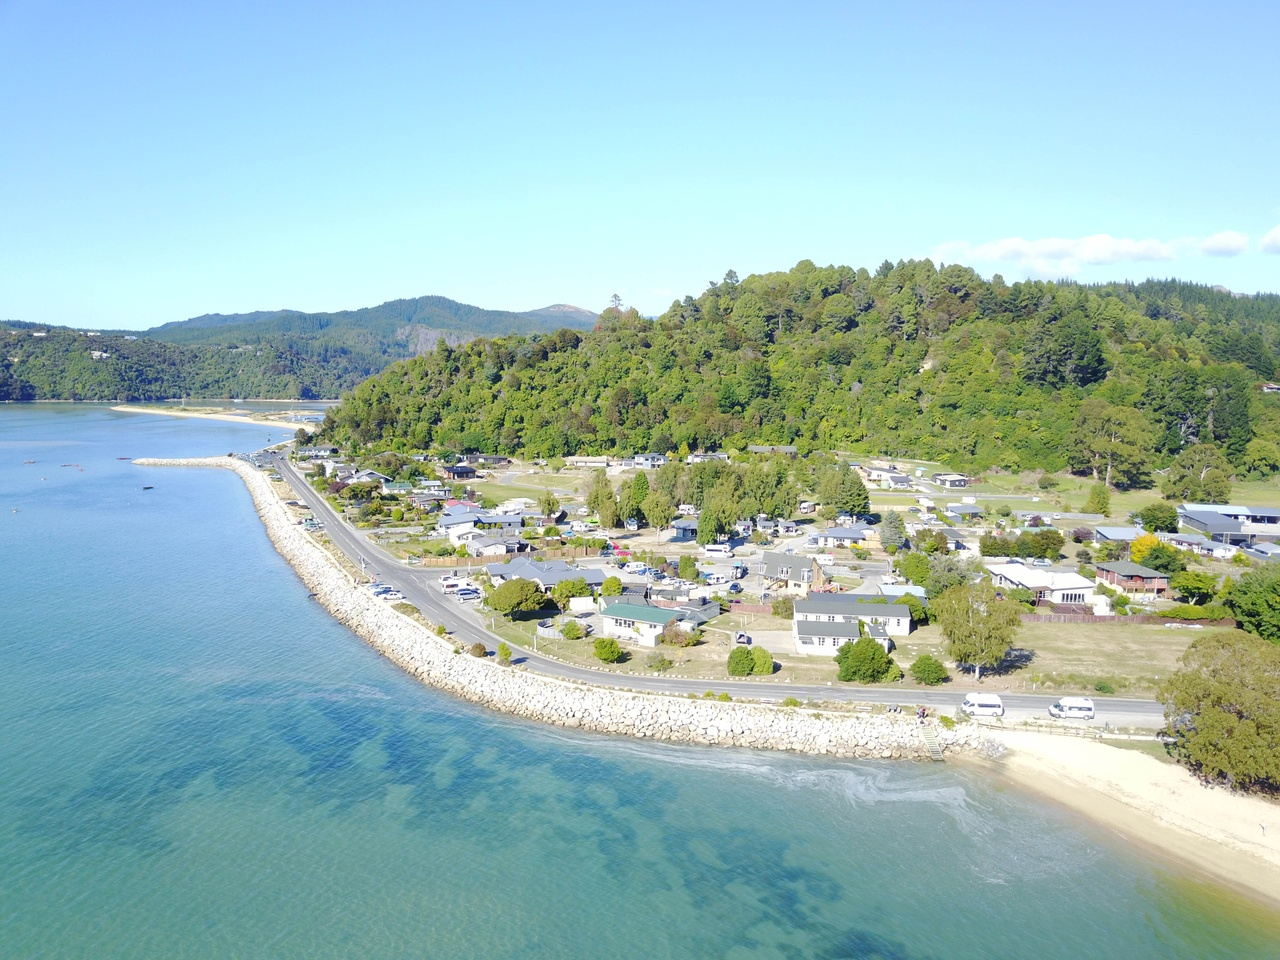 Marahau village and waterfront aerial view pic courtesy abeltasman.com